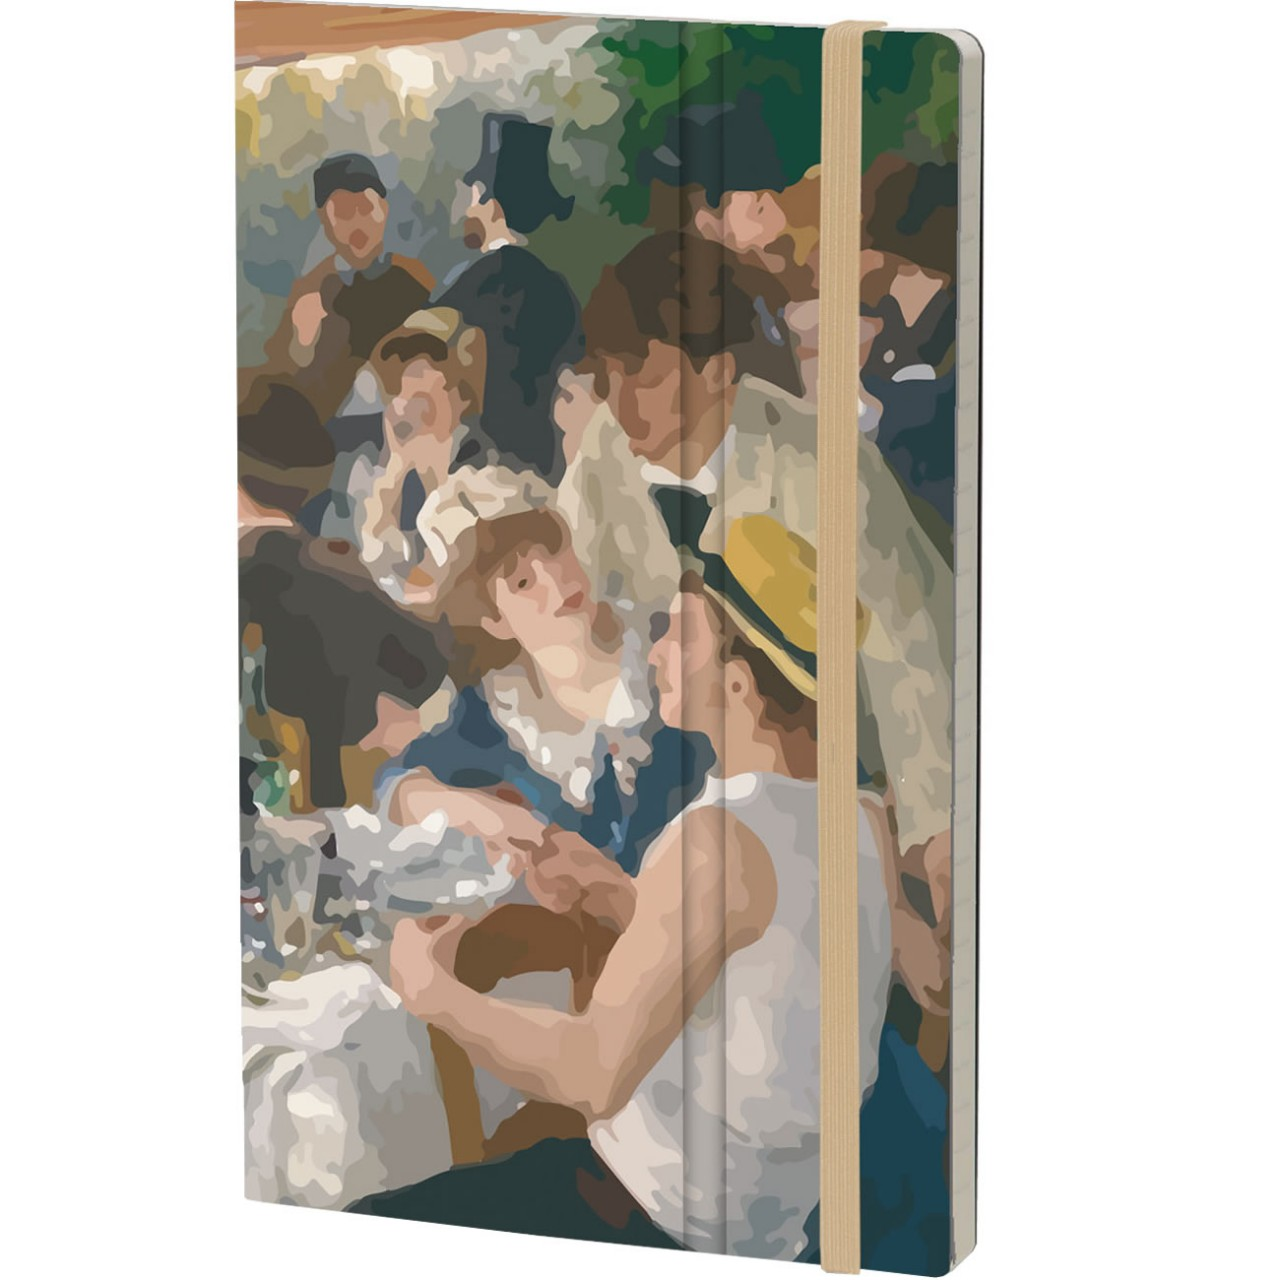 Stifflex Notizbuch ART 13 x 21 cm 192 S., RENOIR